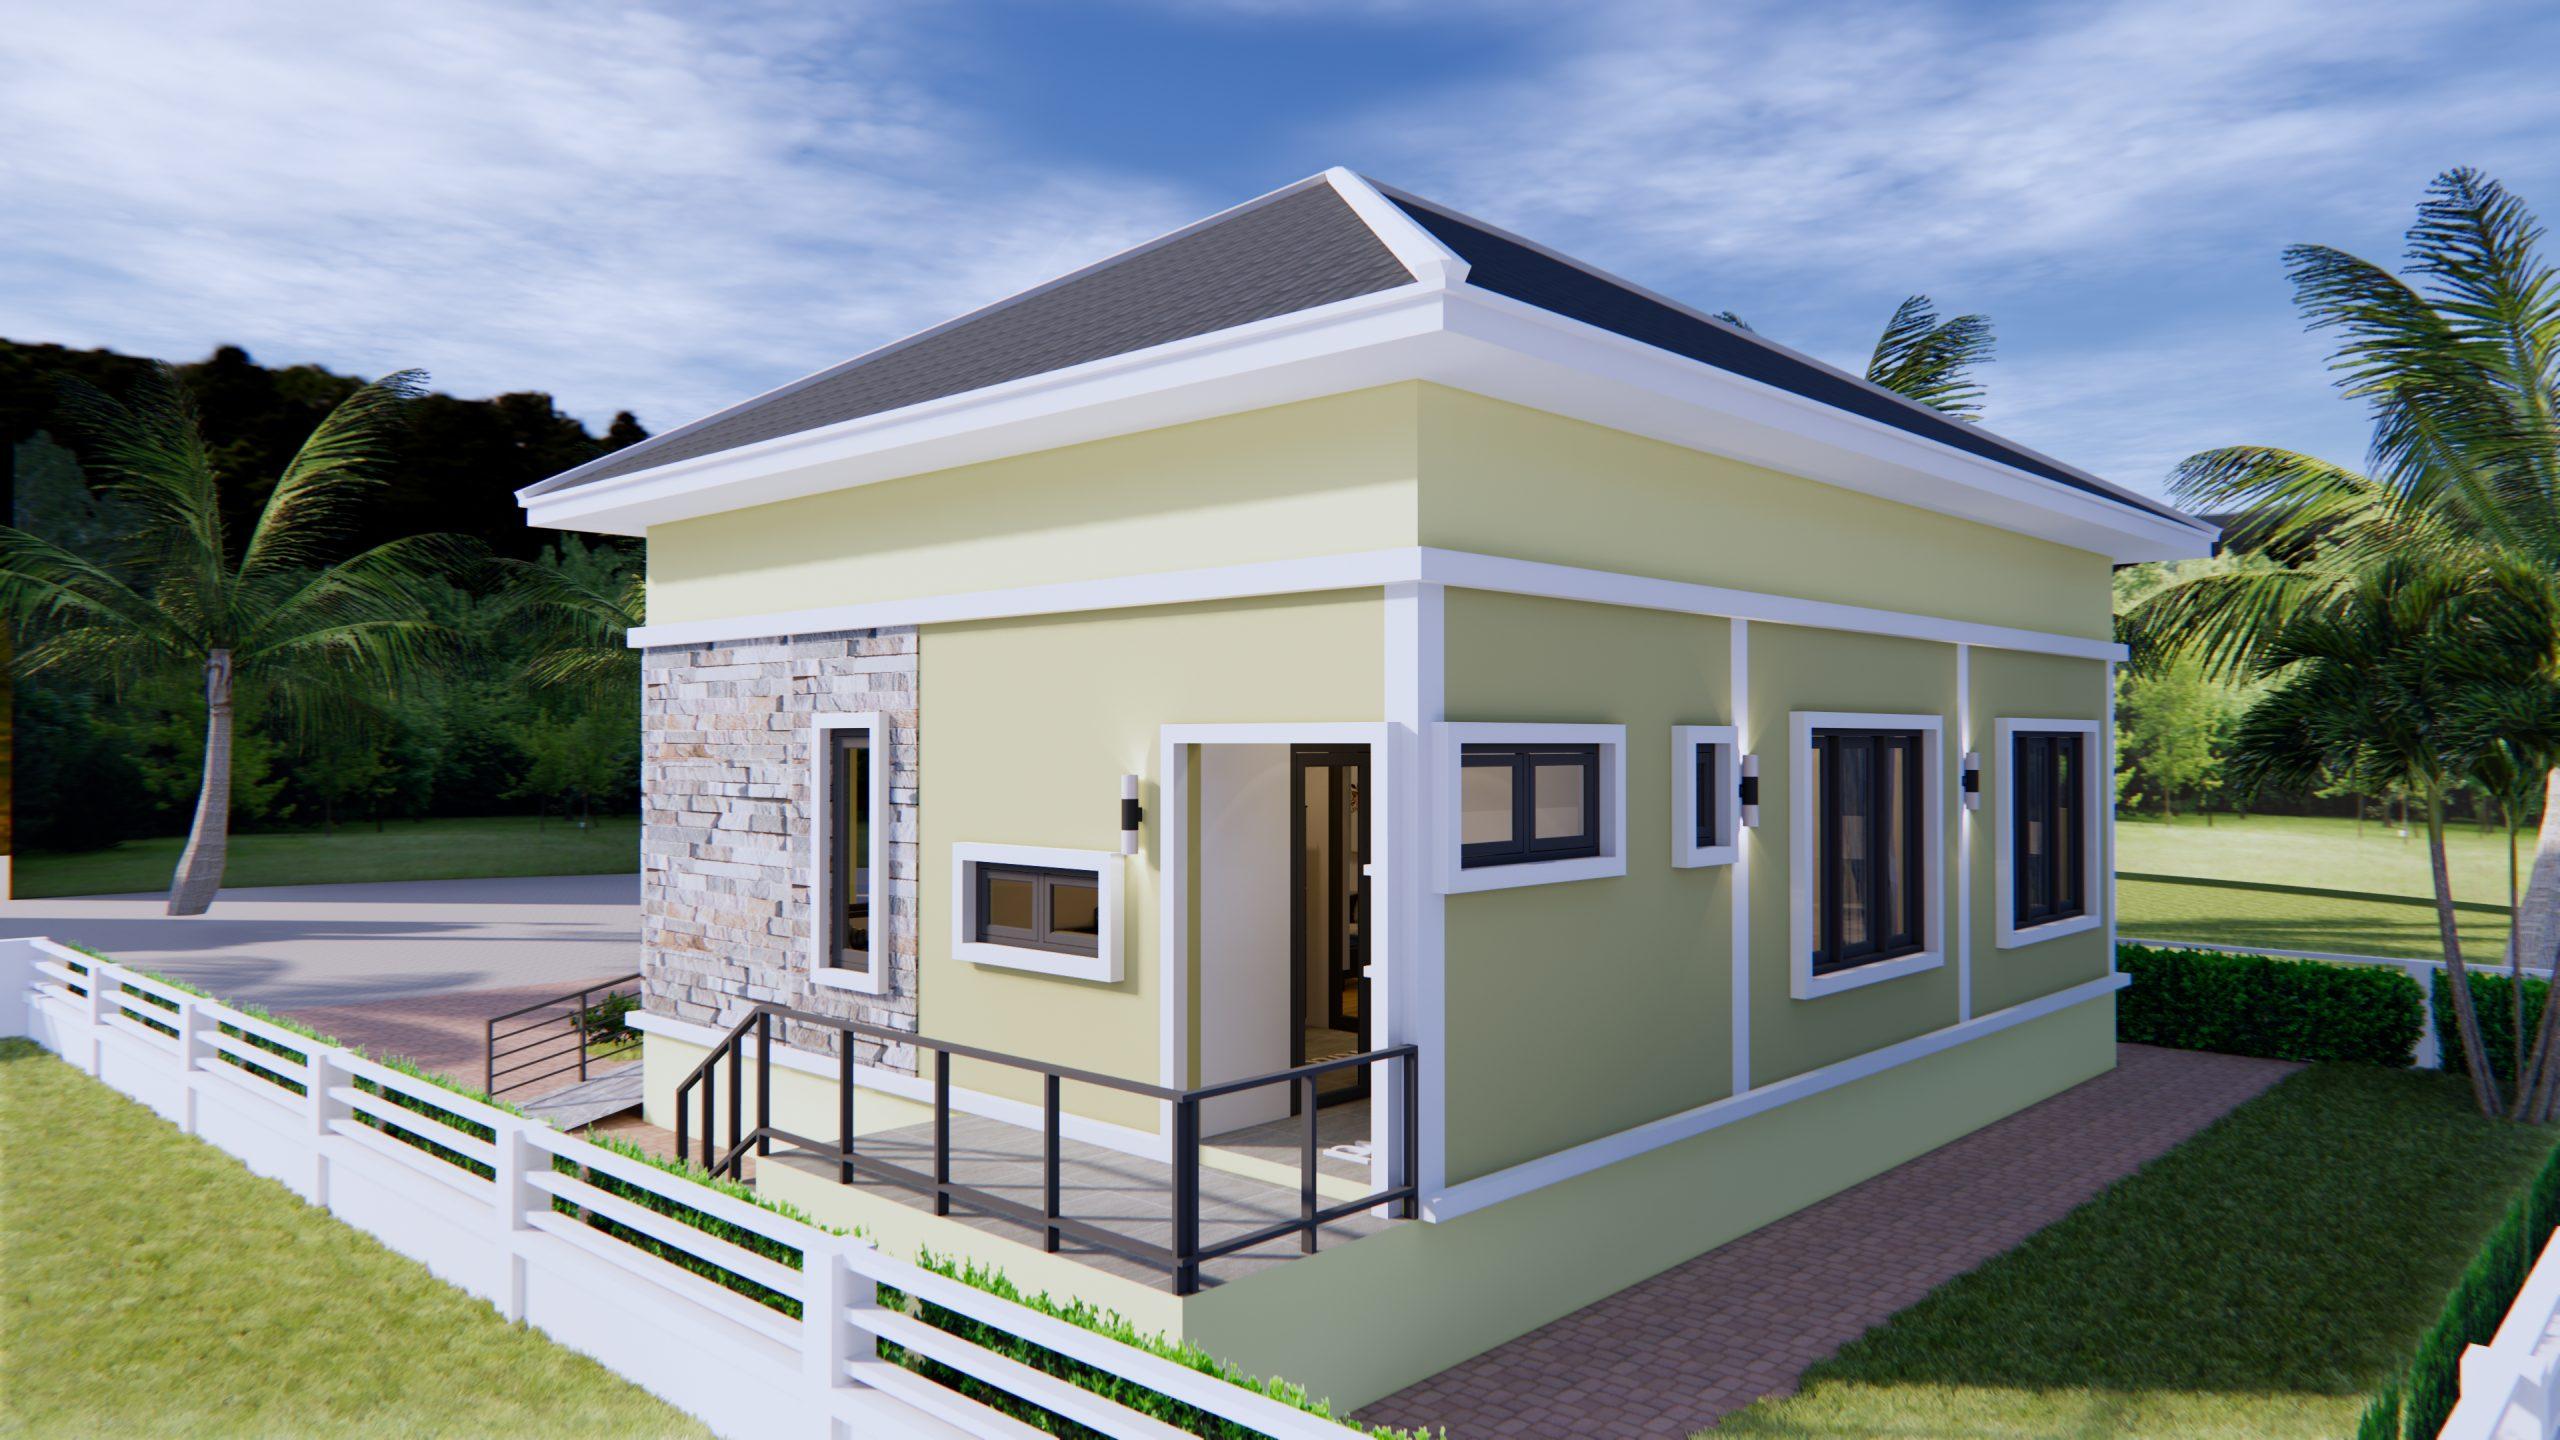 3 Bedroom House Plans 10x10 Meter 33x33 Feet 6